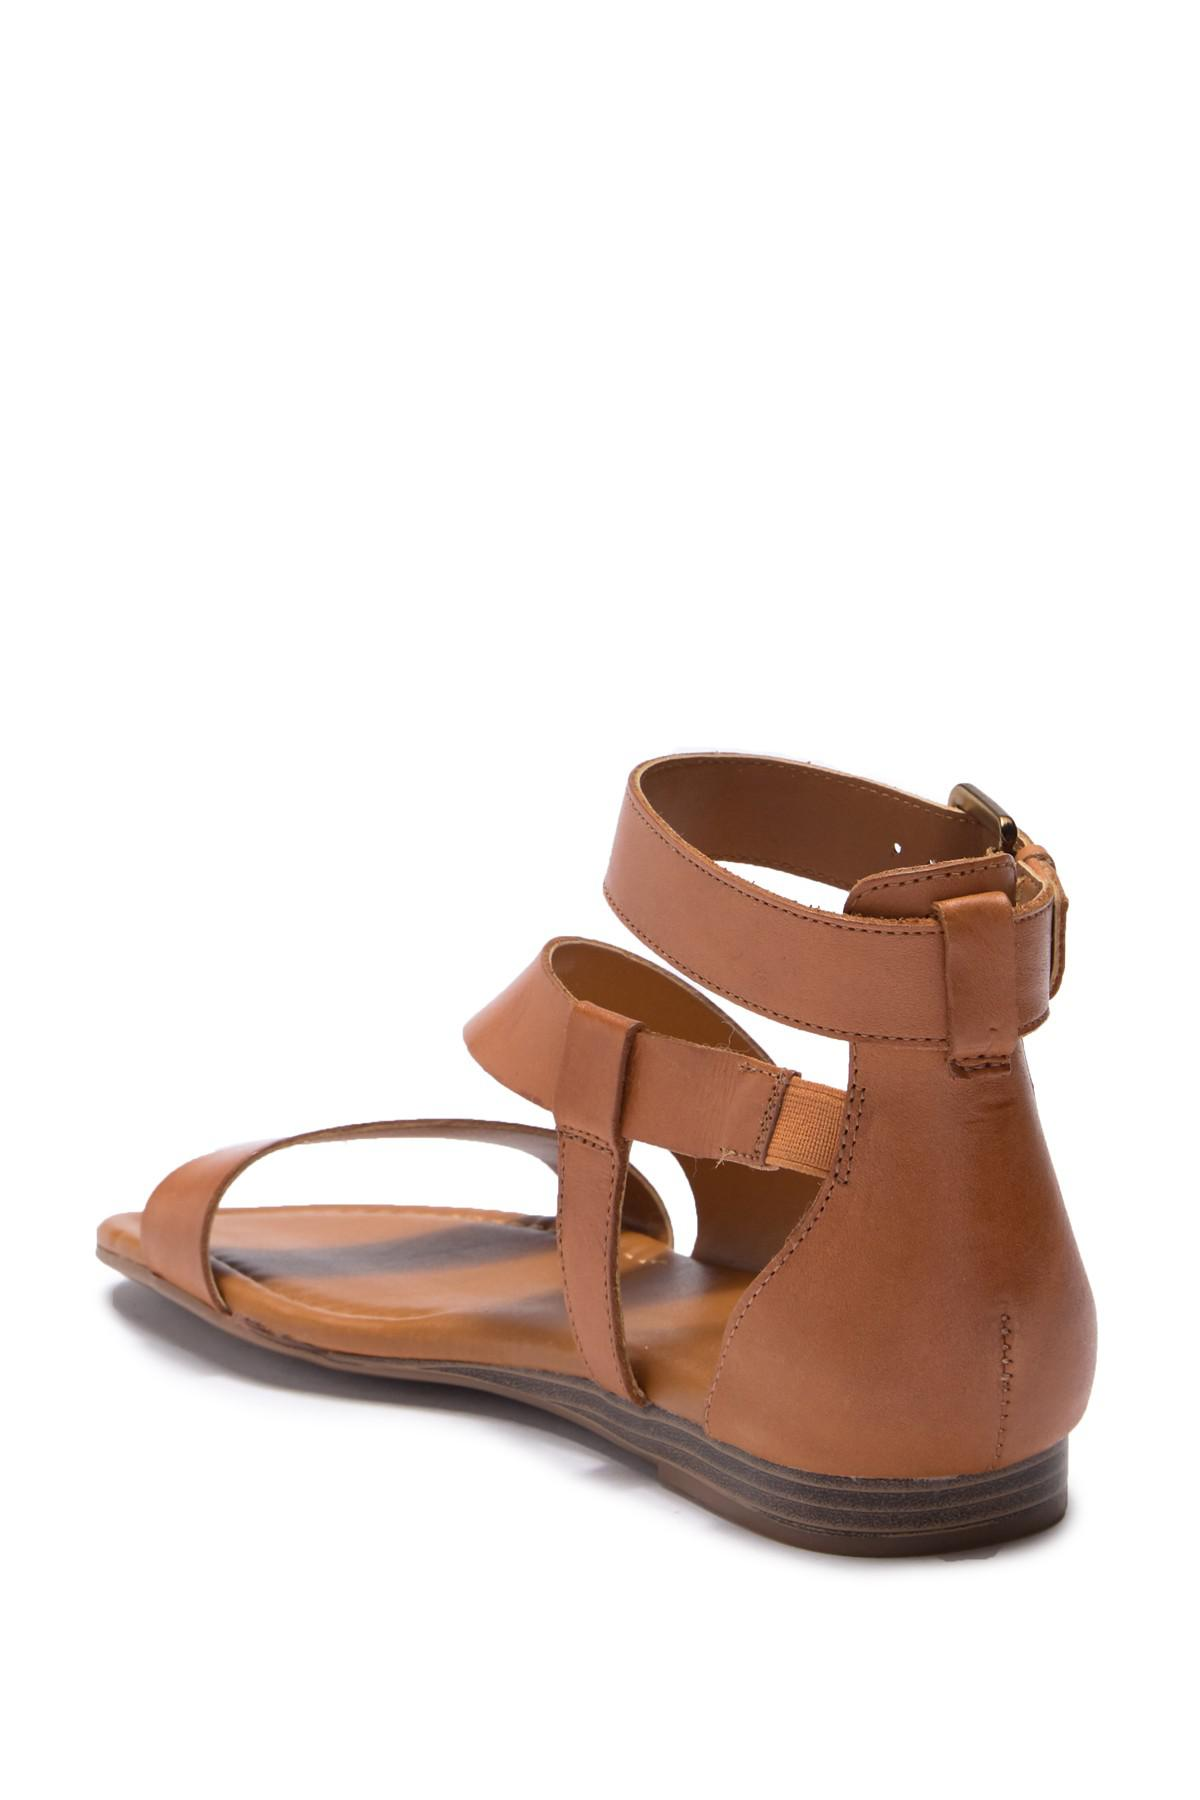 b5e86f54ec21 Franco Sarto - Brown Griffith Leather Sandal - Lyst. View fullscreen